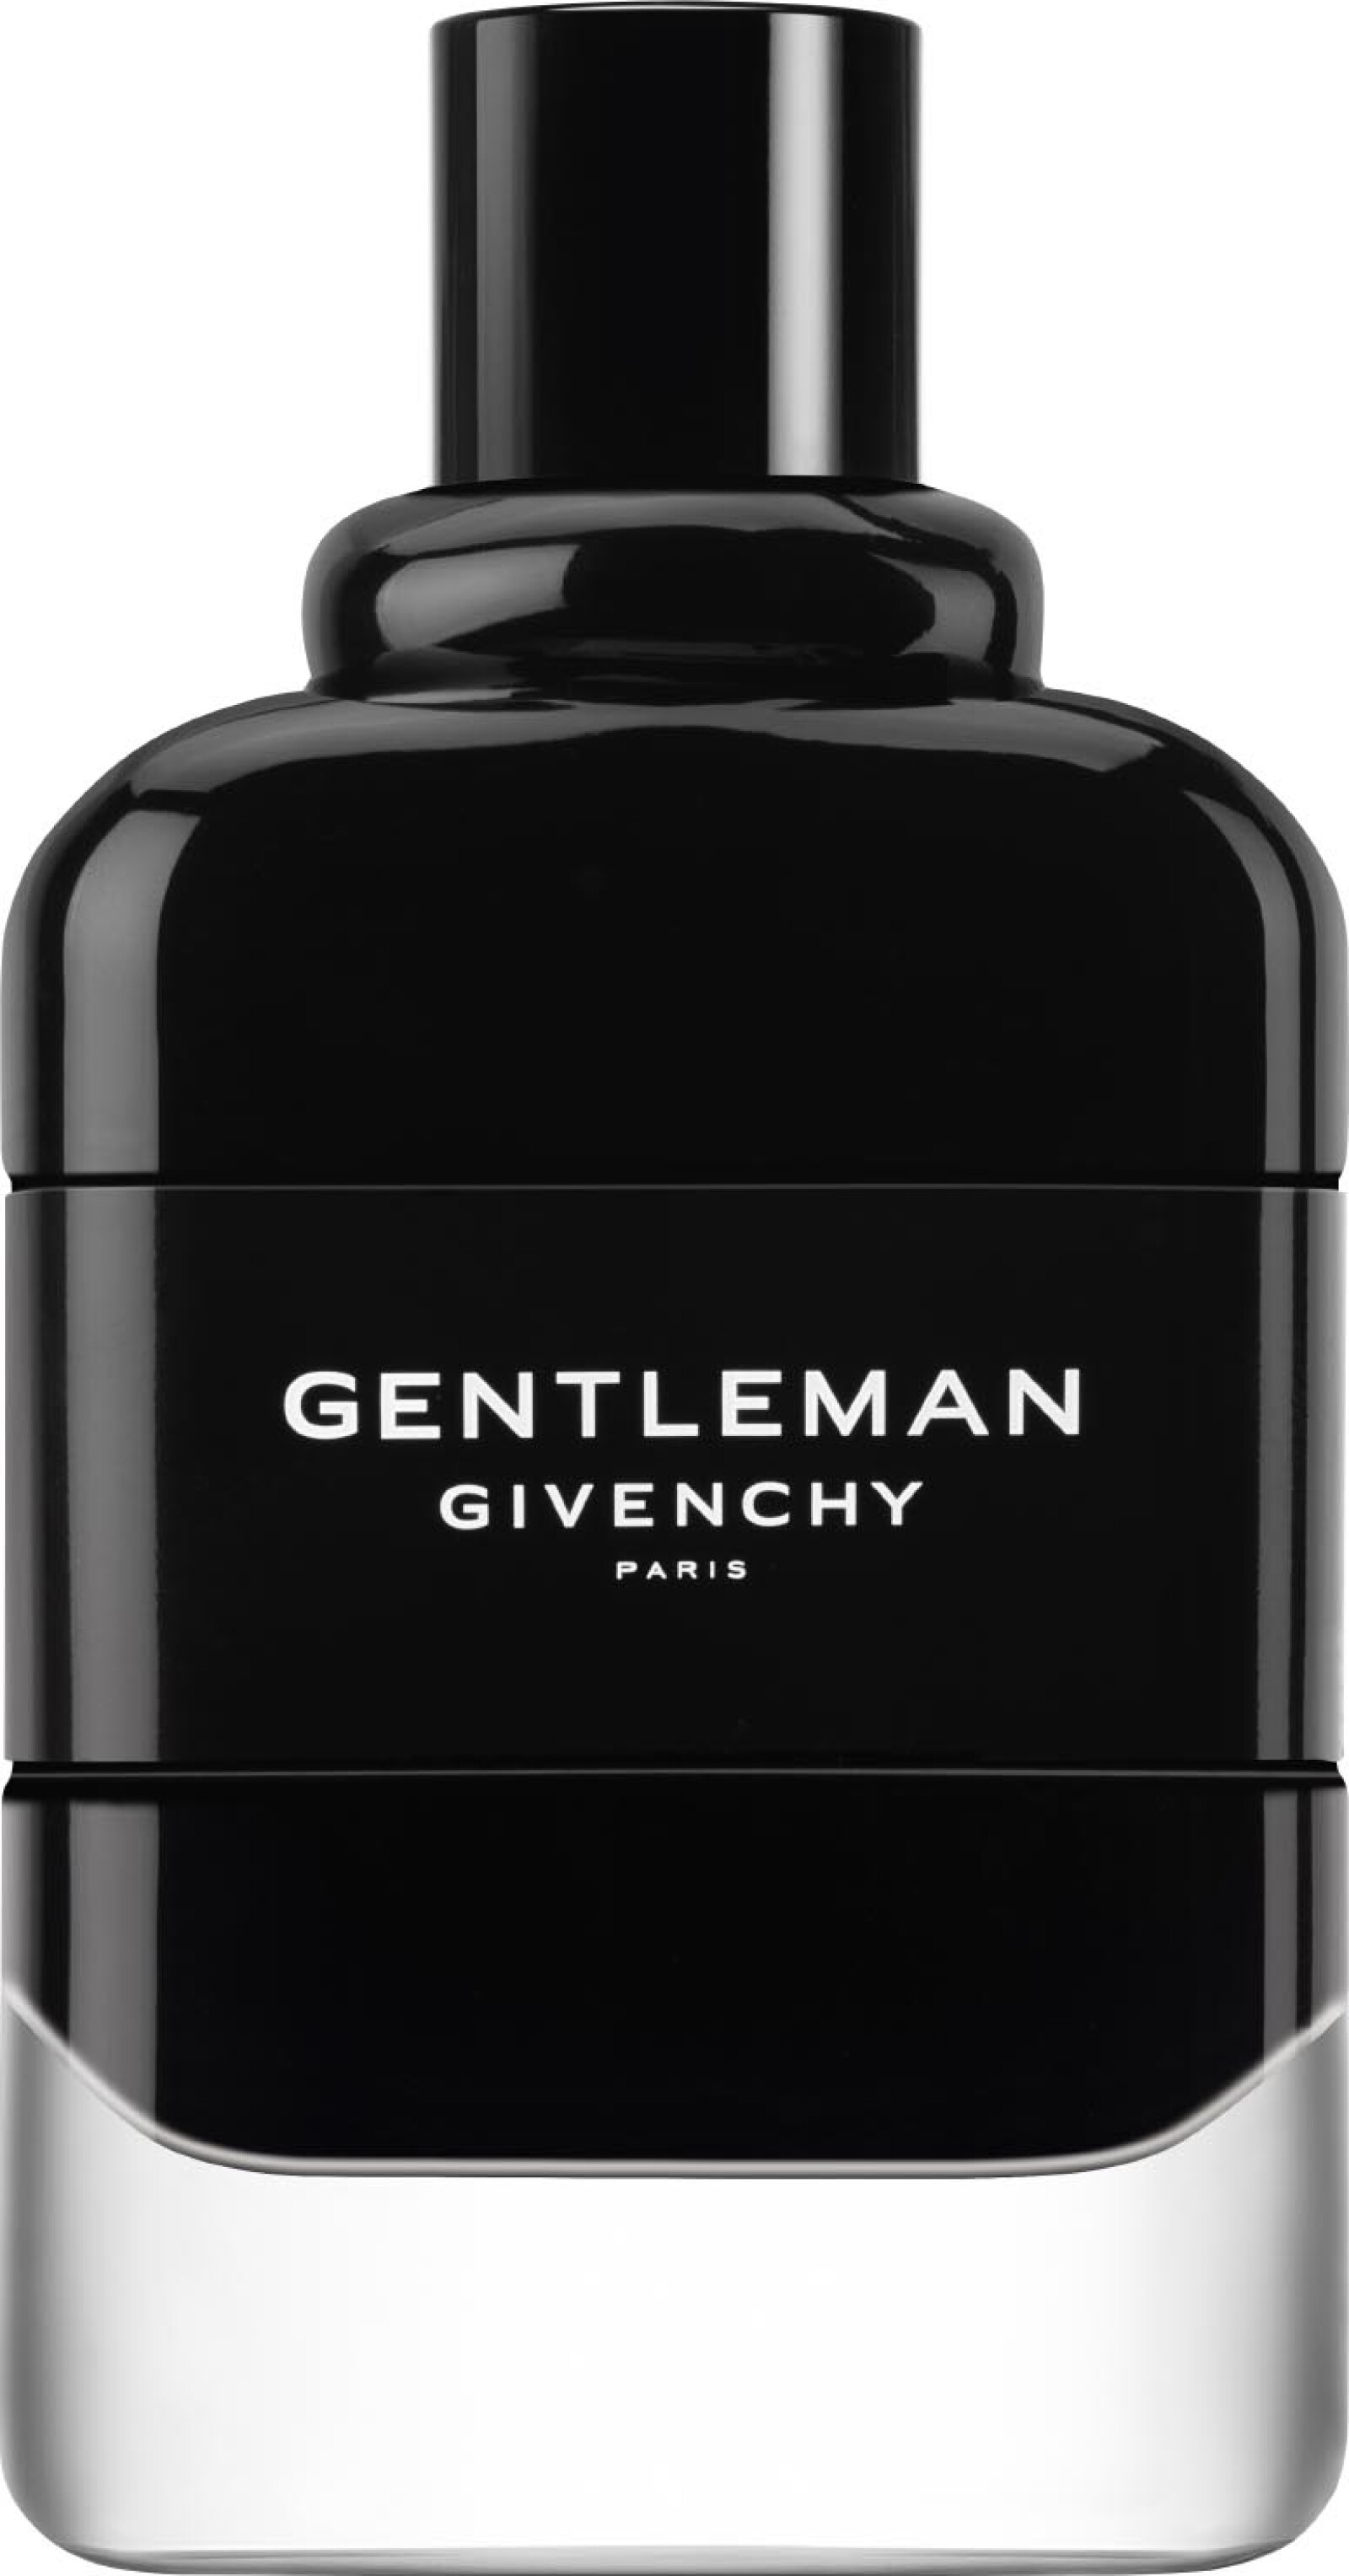 givenchy-gentleman-eau-de-parfum-spray-100ml_1